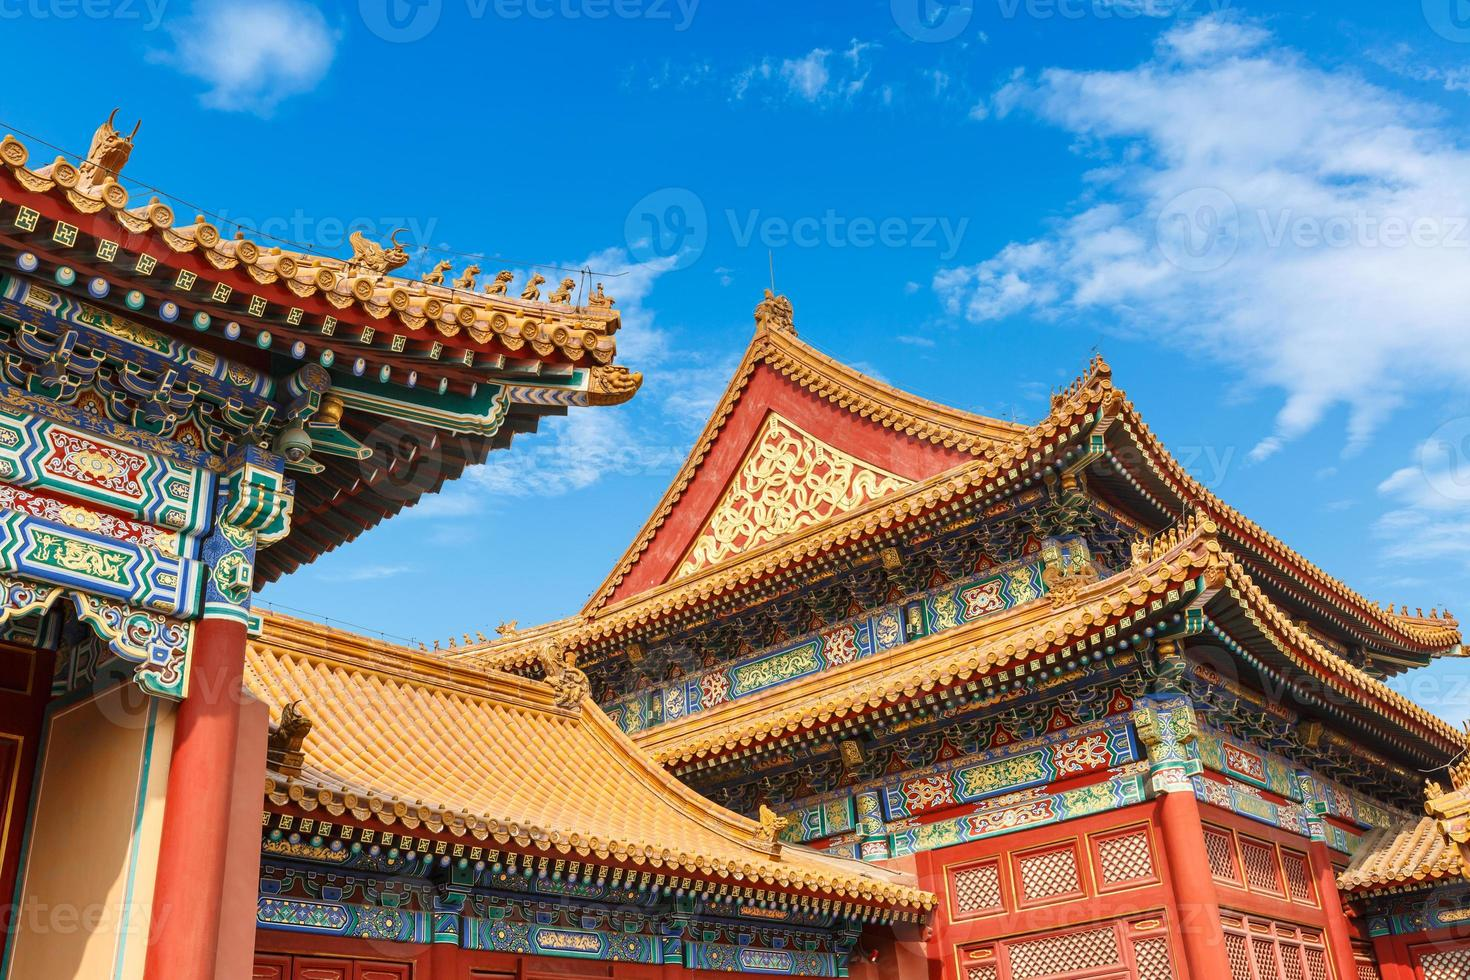 forbidden city in beijing,China photo